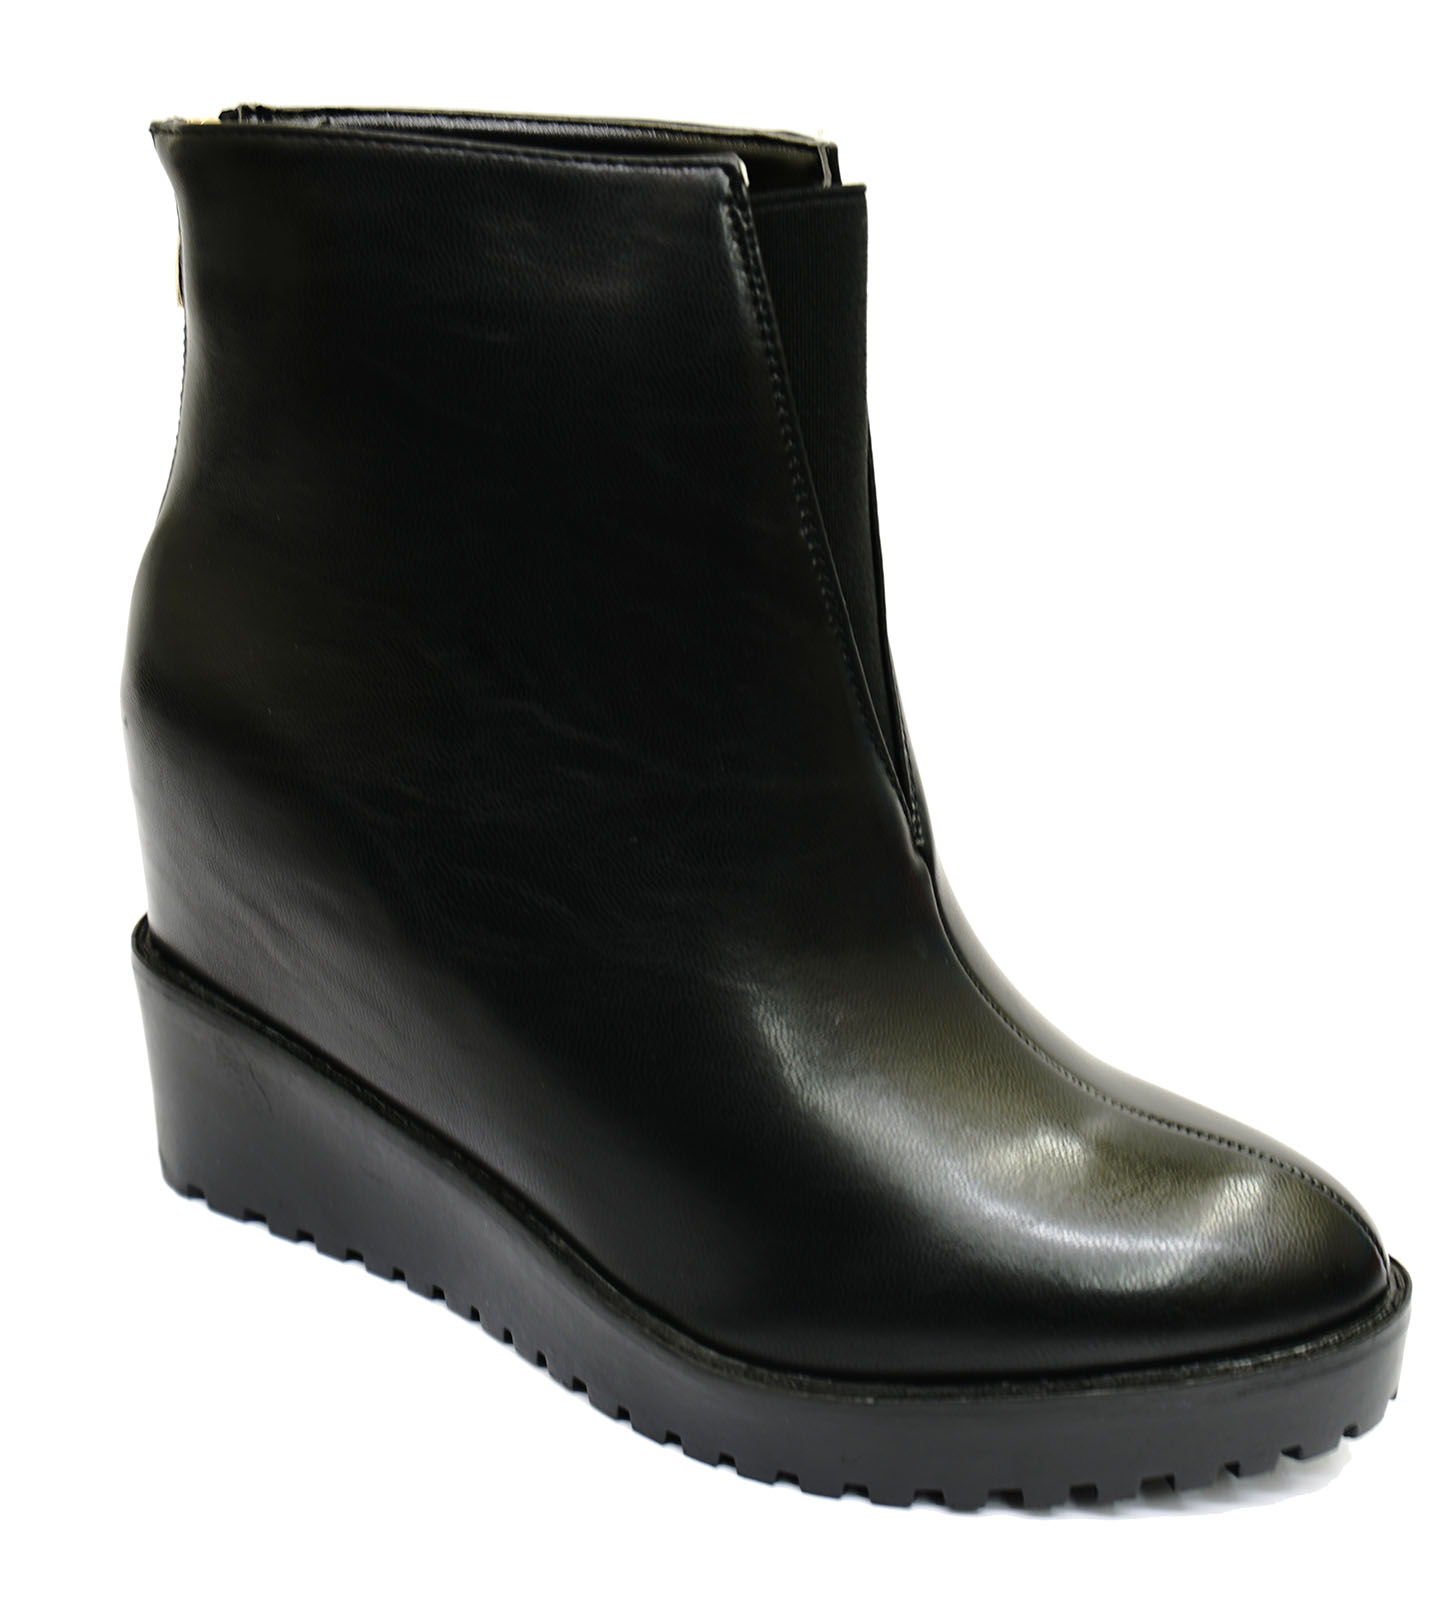 black wedge zip up ankle calf comfy smart work